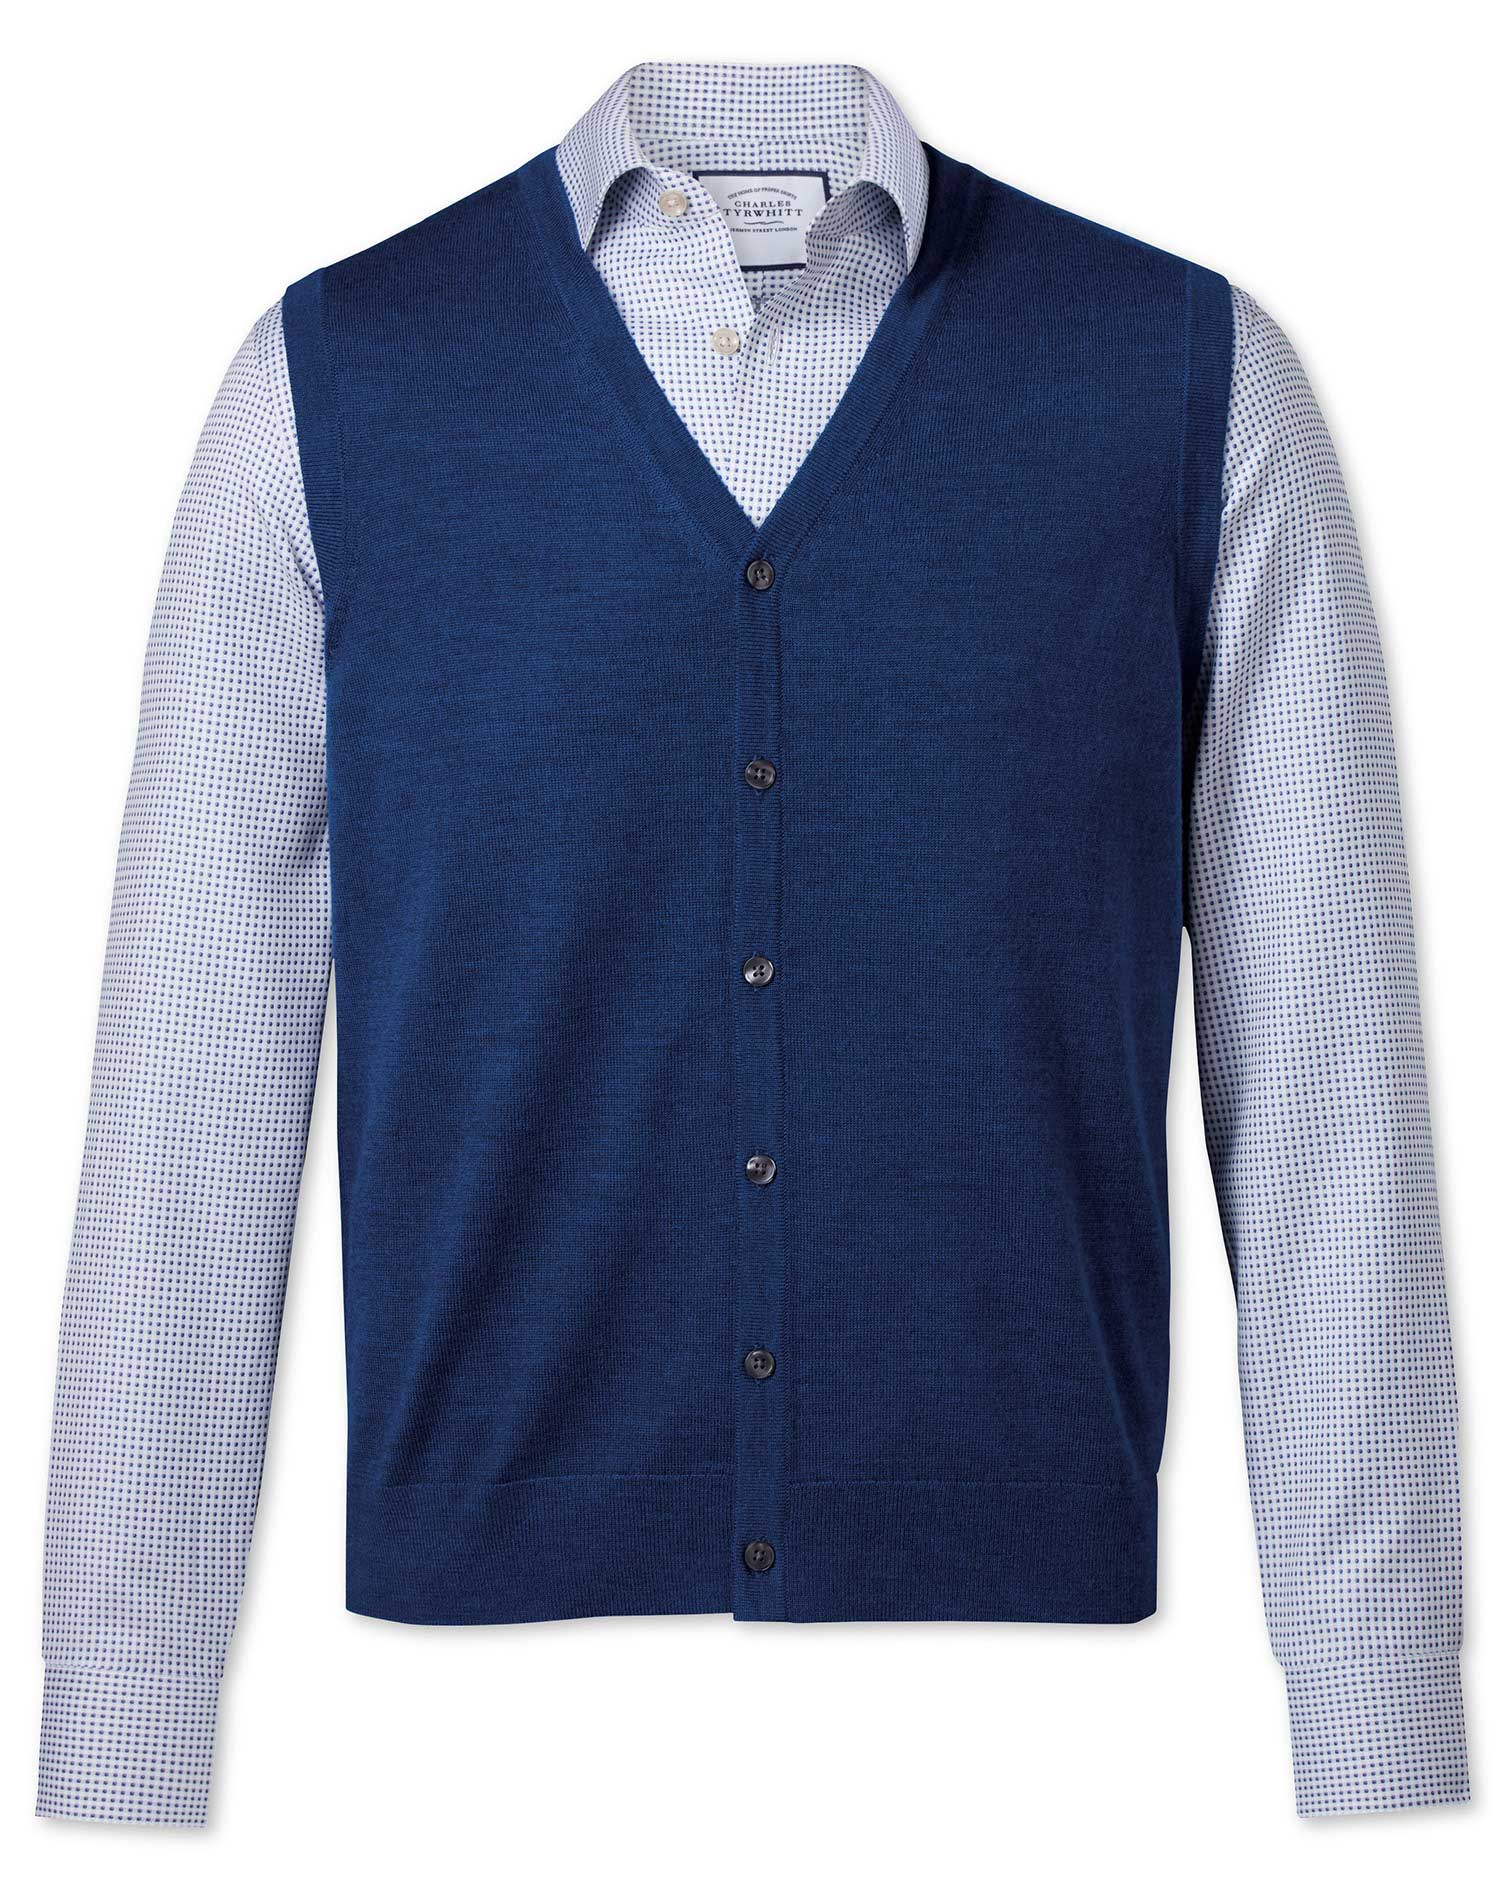 Royal Blue Merino Wool Waistcoat Size Medium by Charles Tyrwhitt